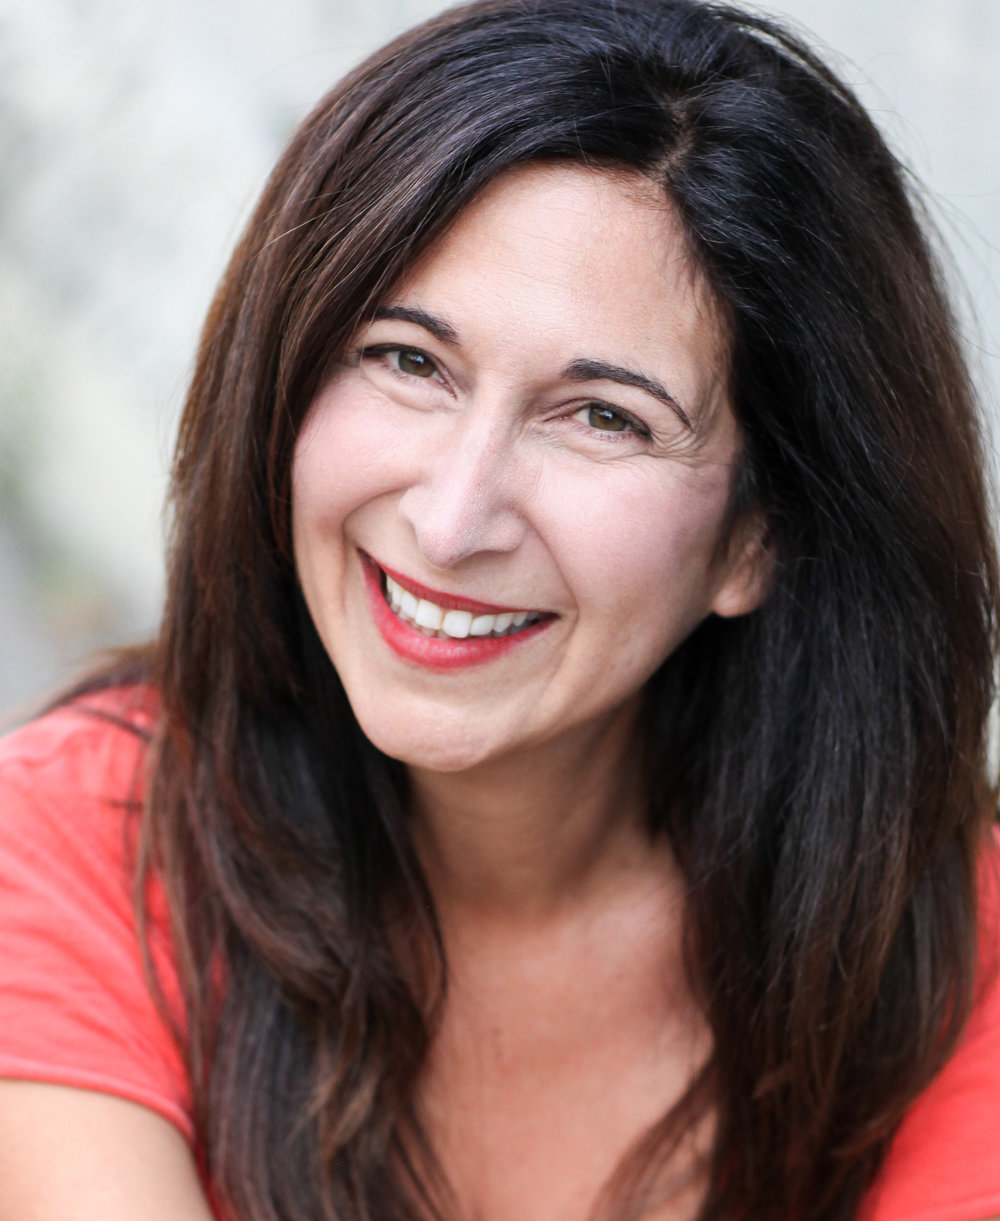 Amy Herzberg, Associate Artistic Director (479) 445-6333 amy@theatre2.org